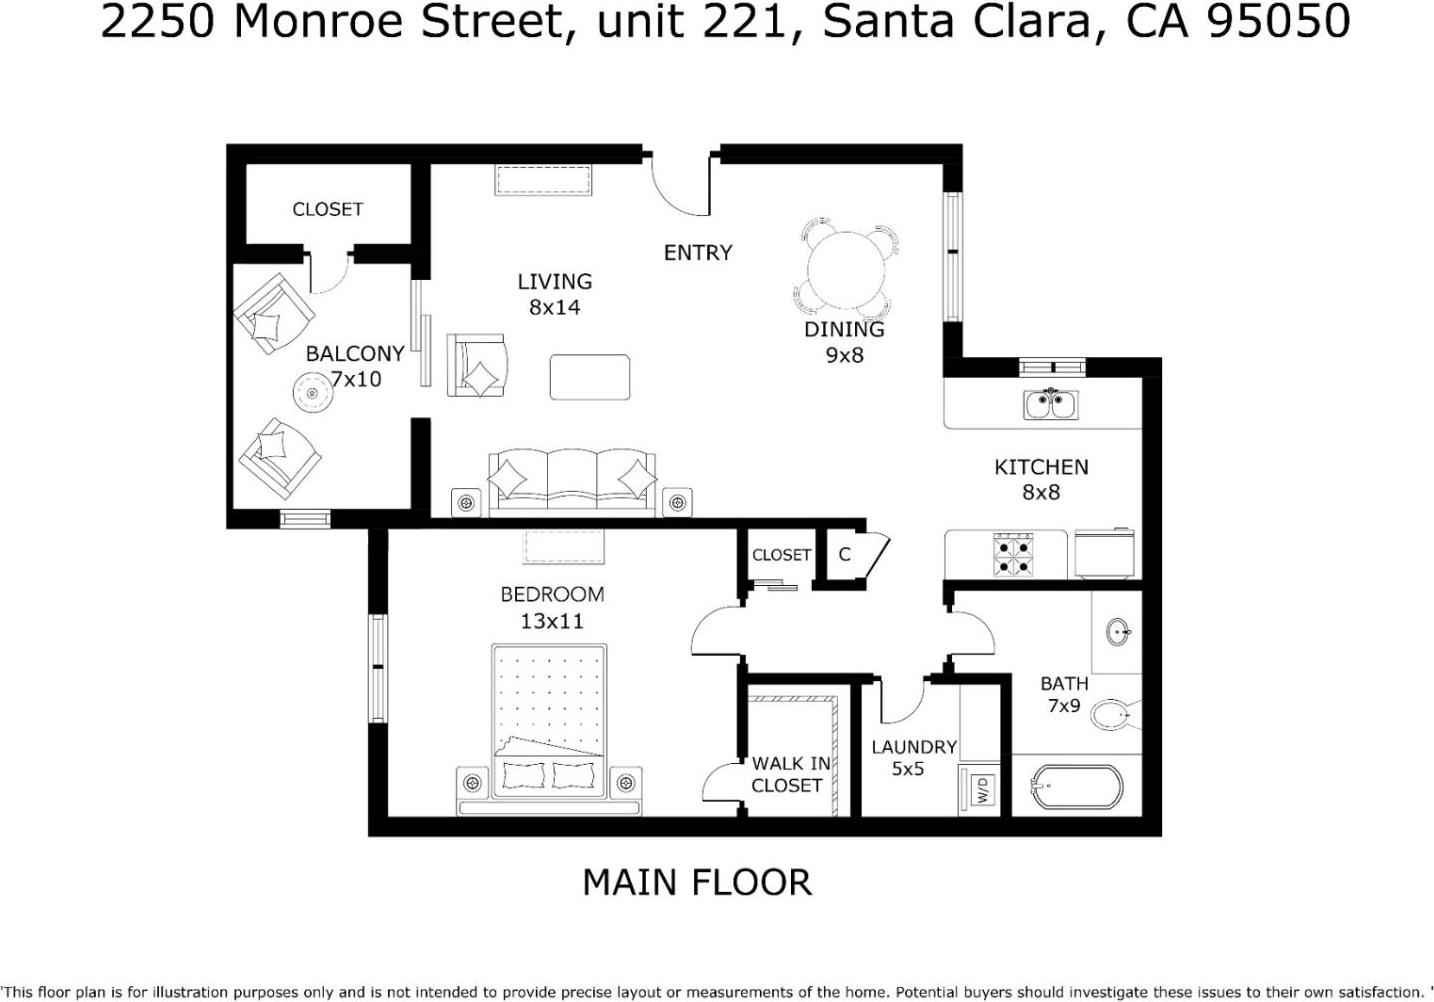 2250 Monroe ST 221